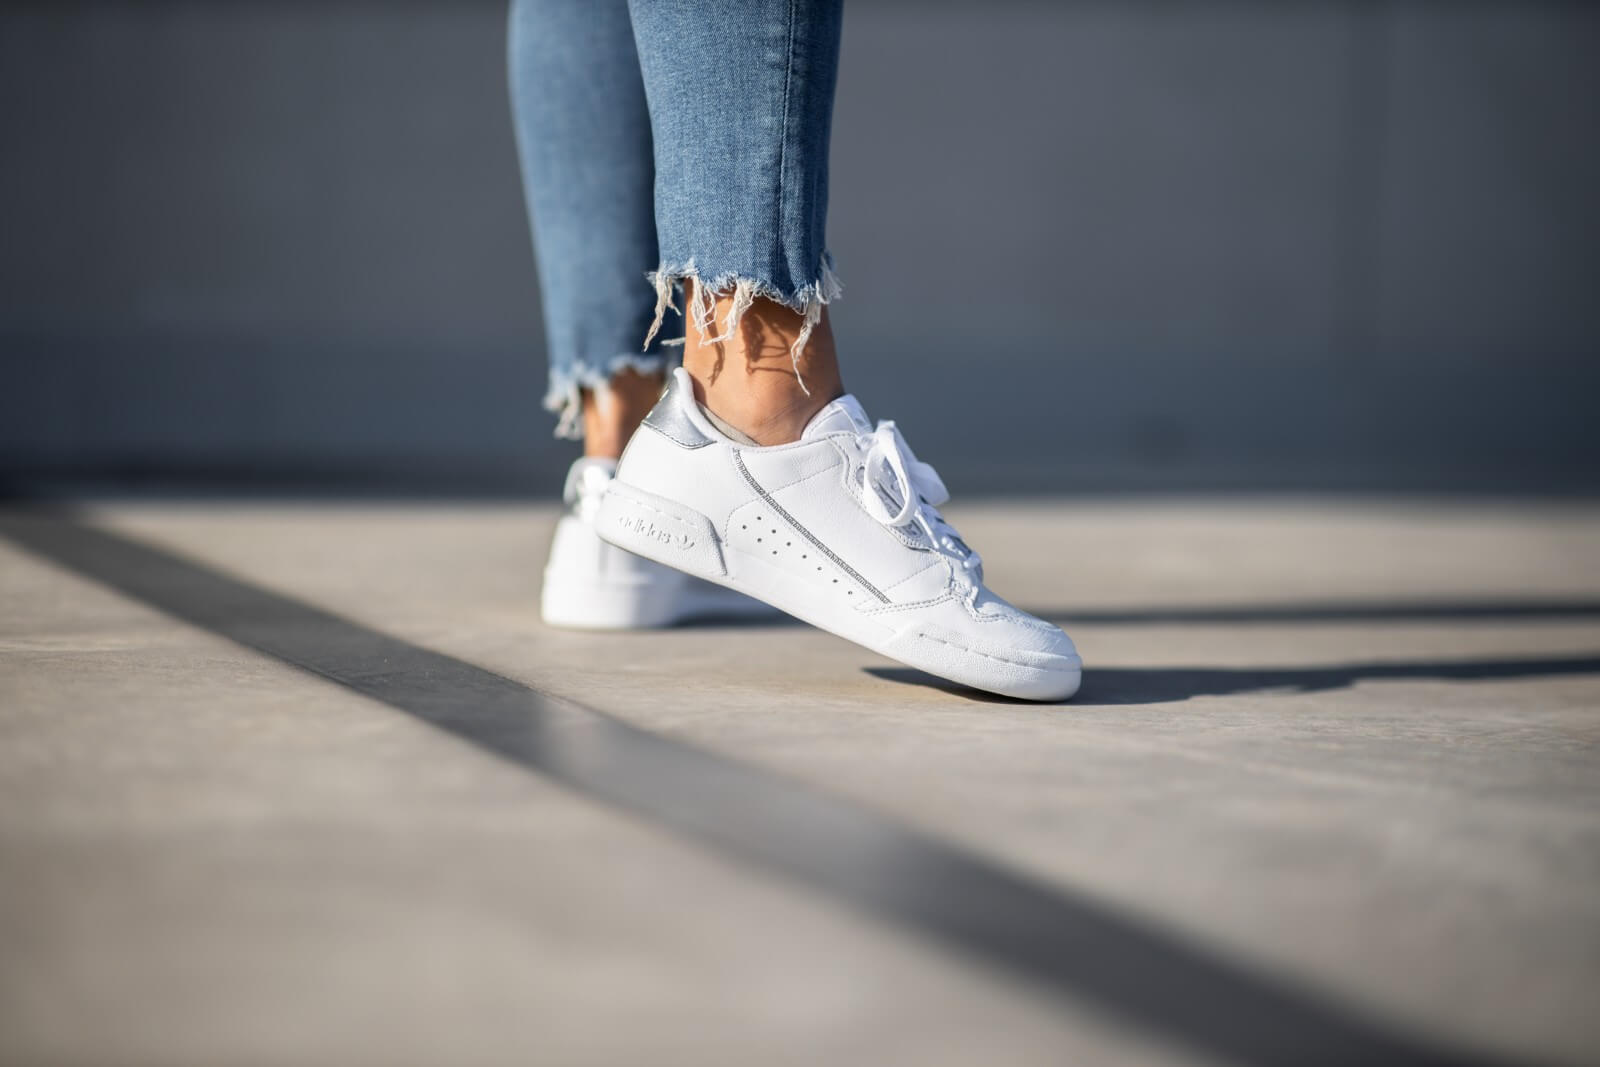 Adidas Women's Continental 80 Footwear